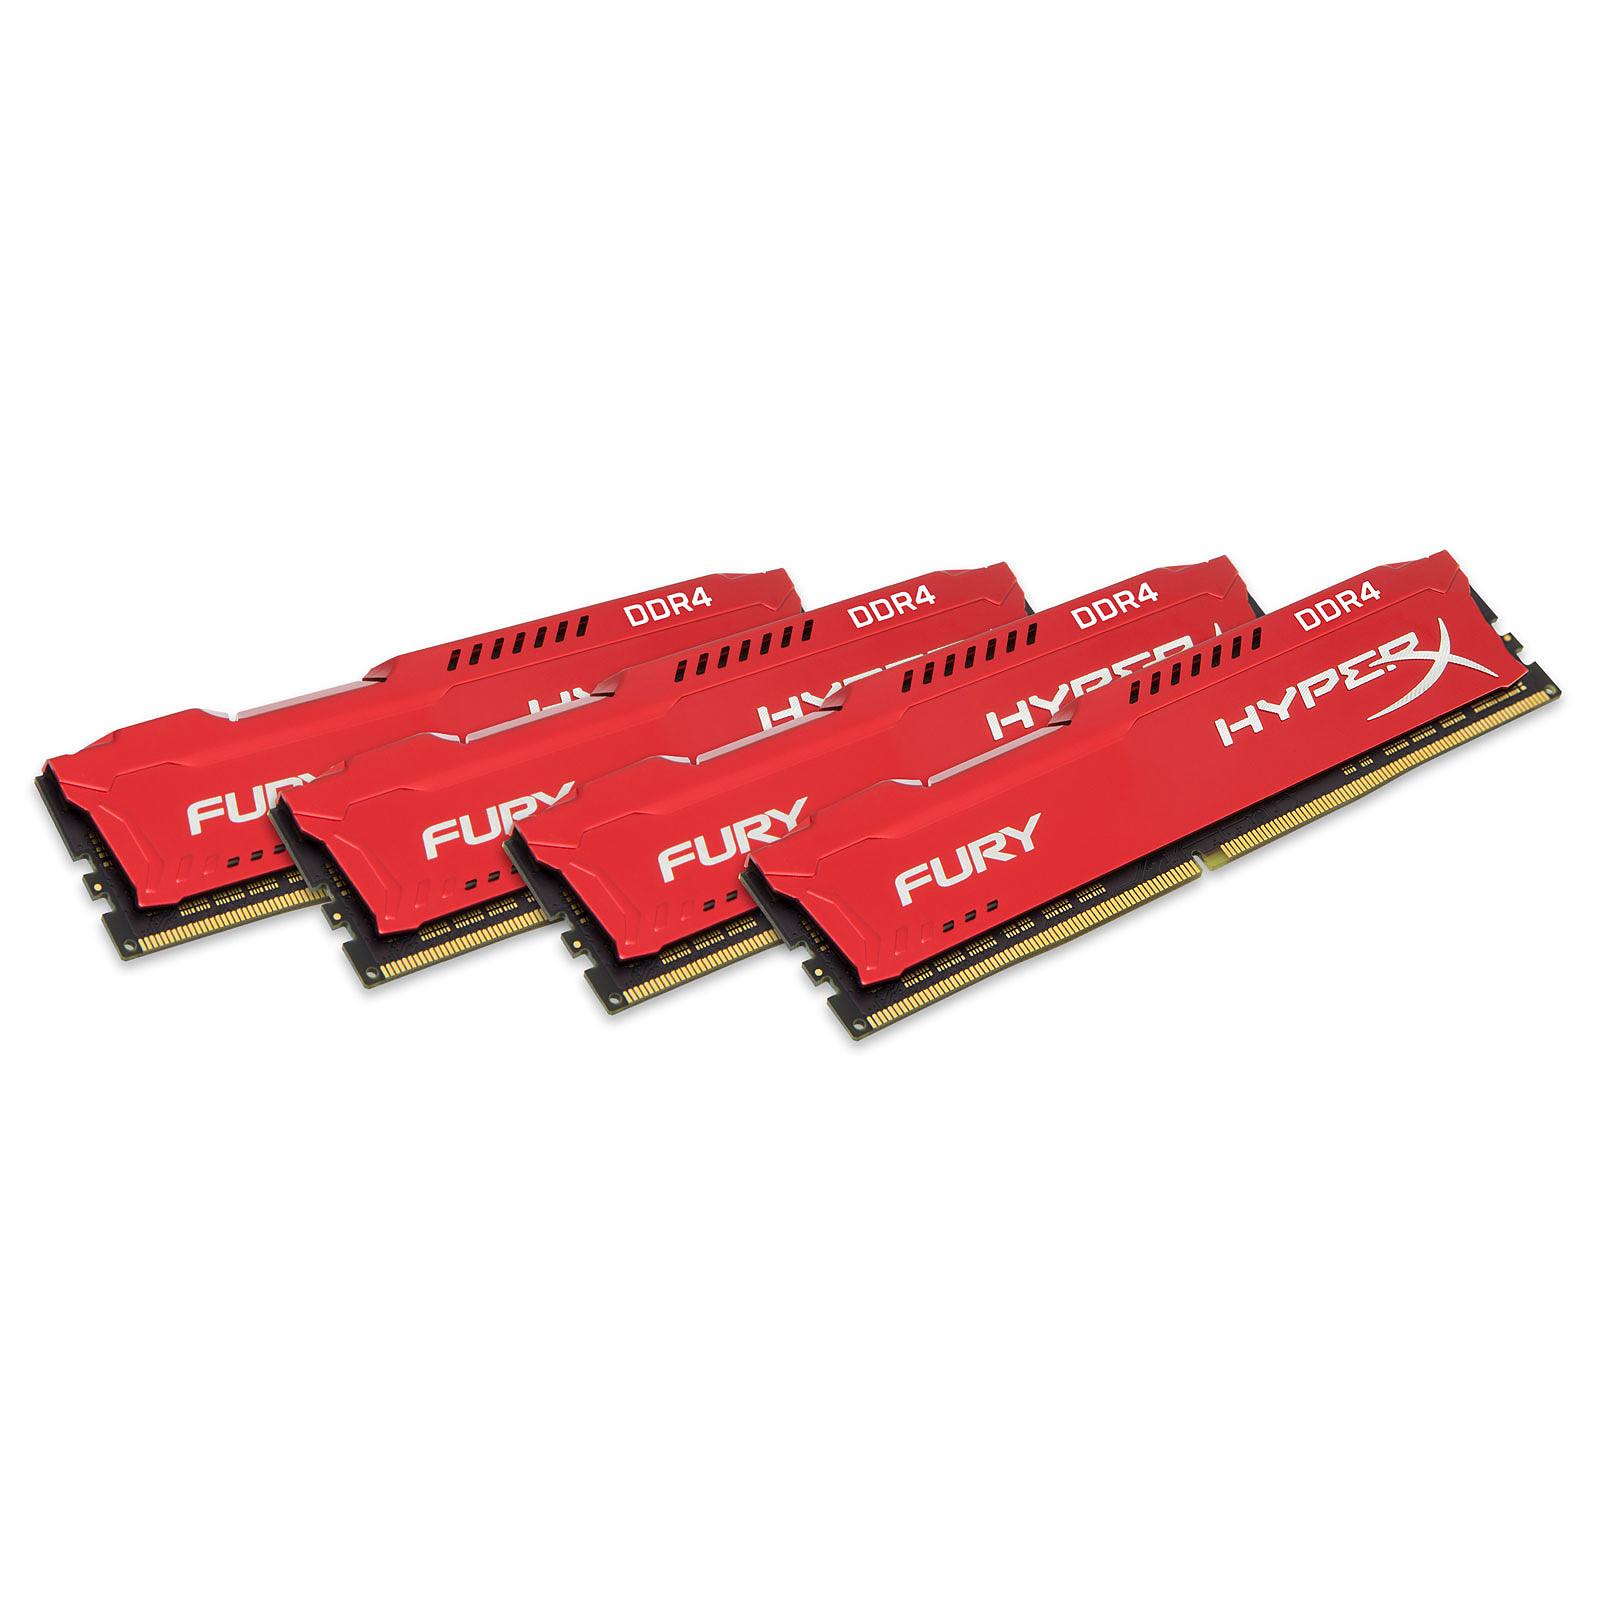 HyperX Fury Rouge 64 Go (4x 16 Go) DDR4 2133 MHz CL14